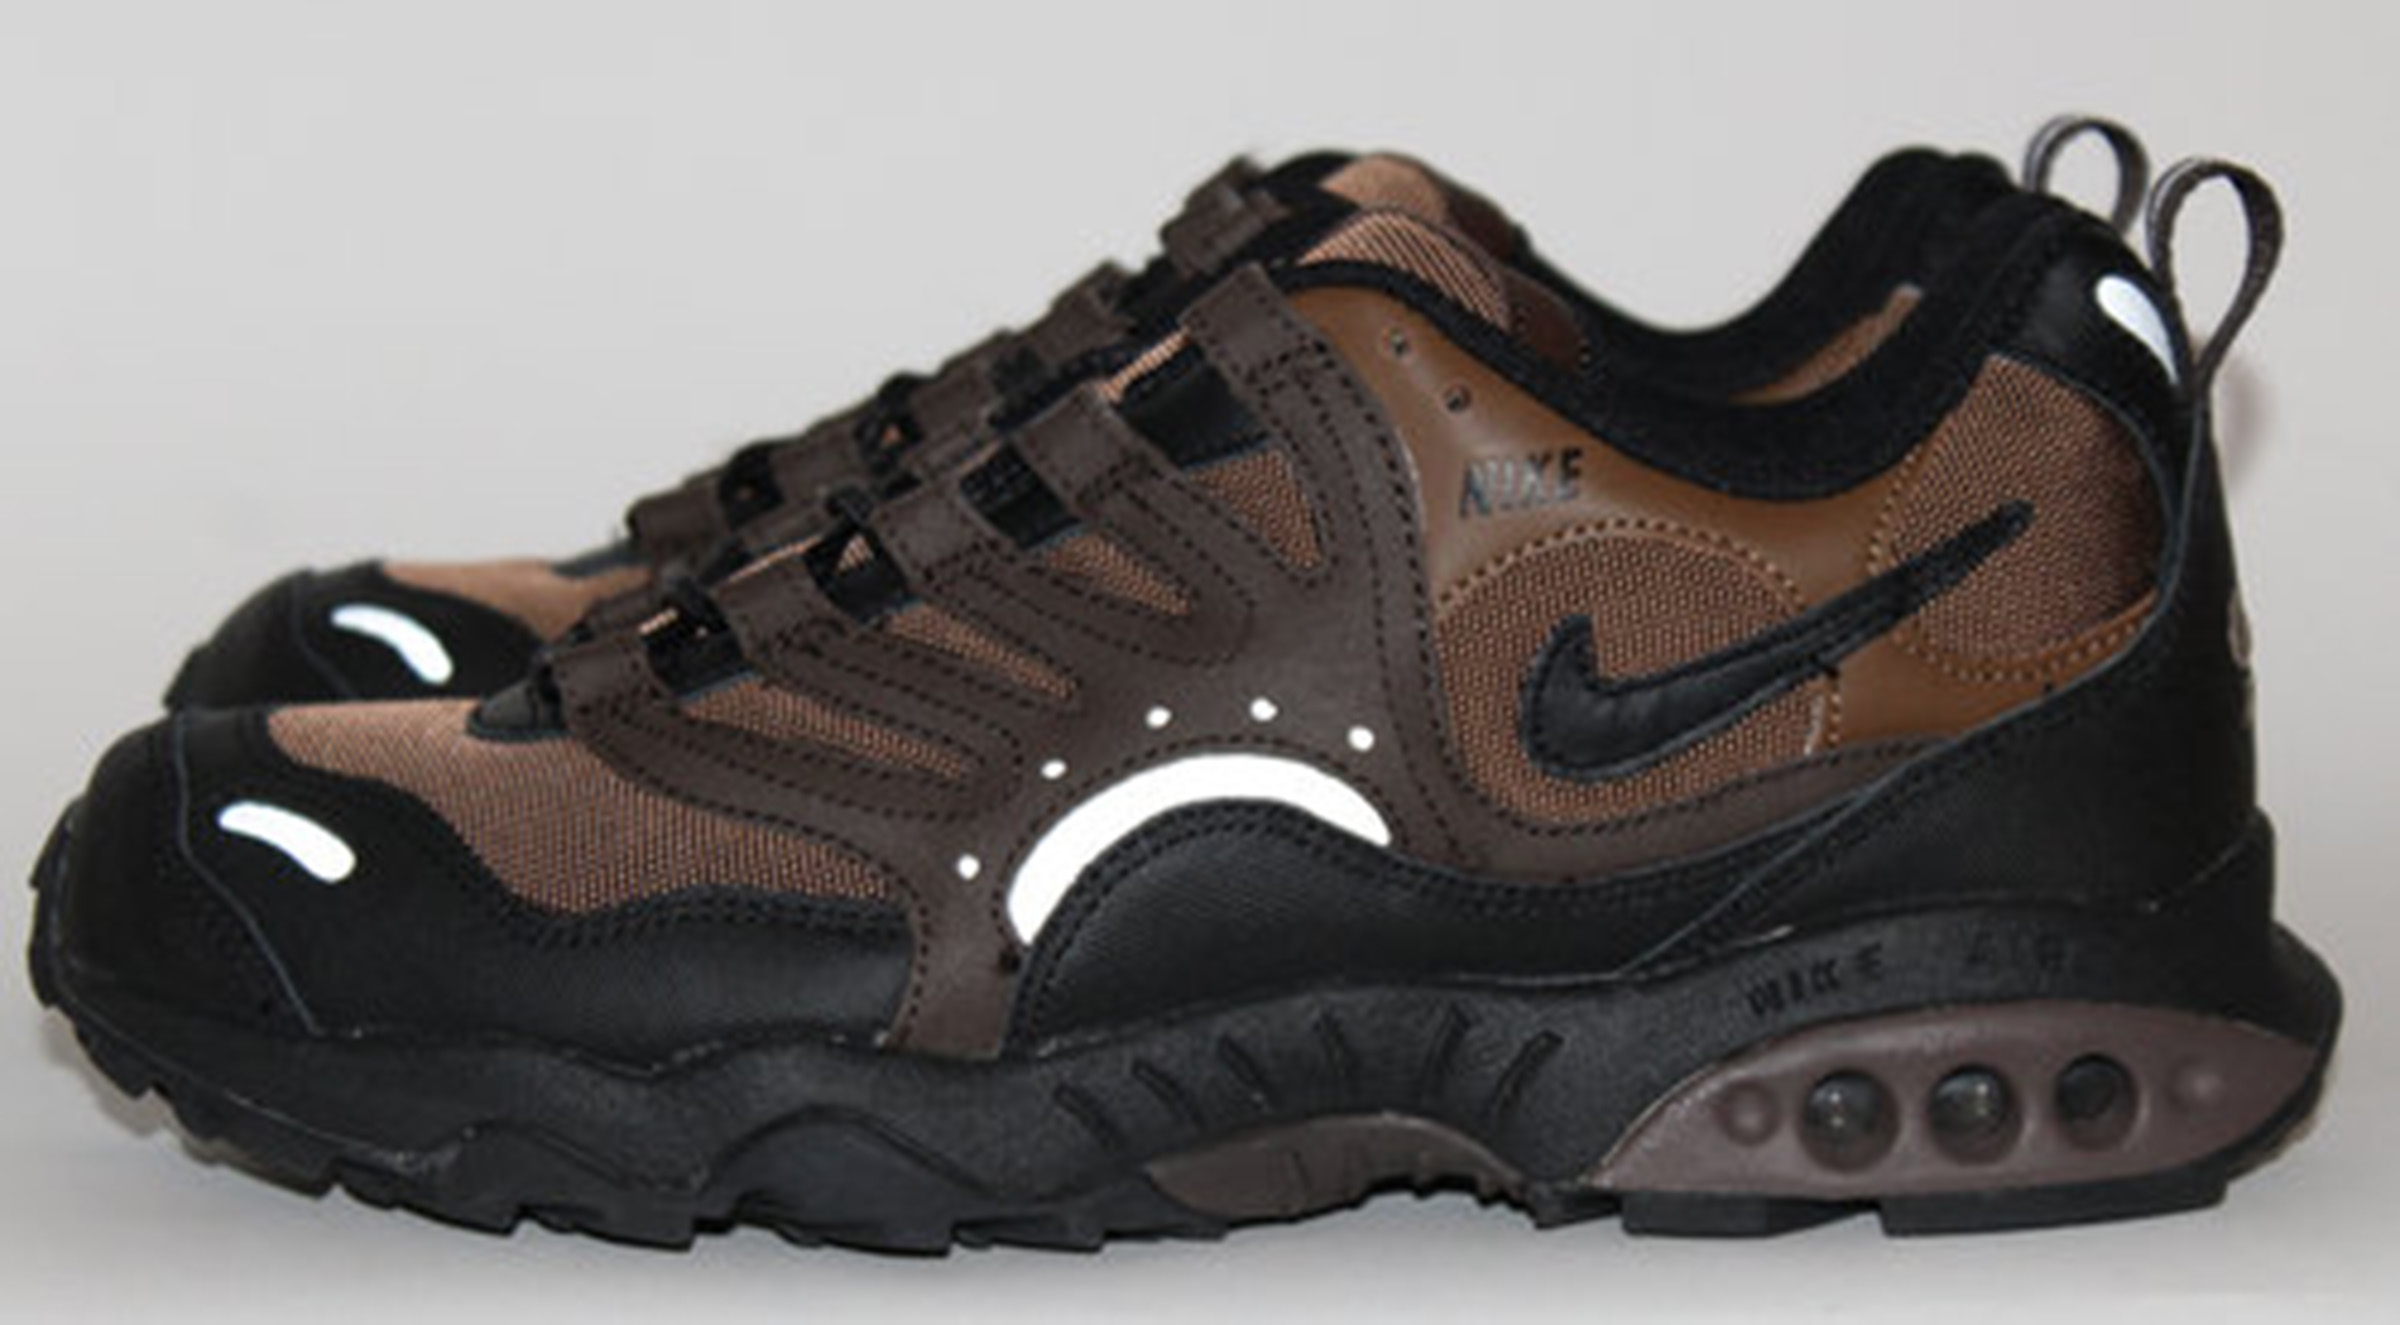 Nike Air Terra Humara Brown DS (Size 11